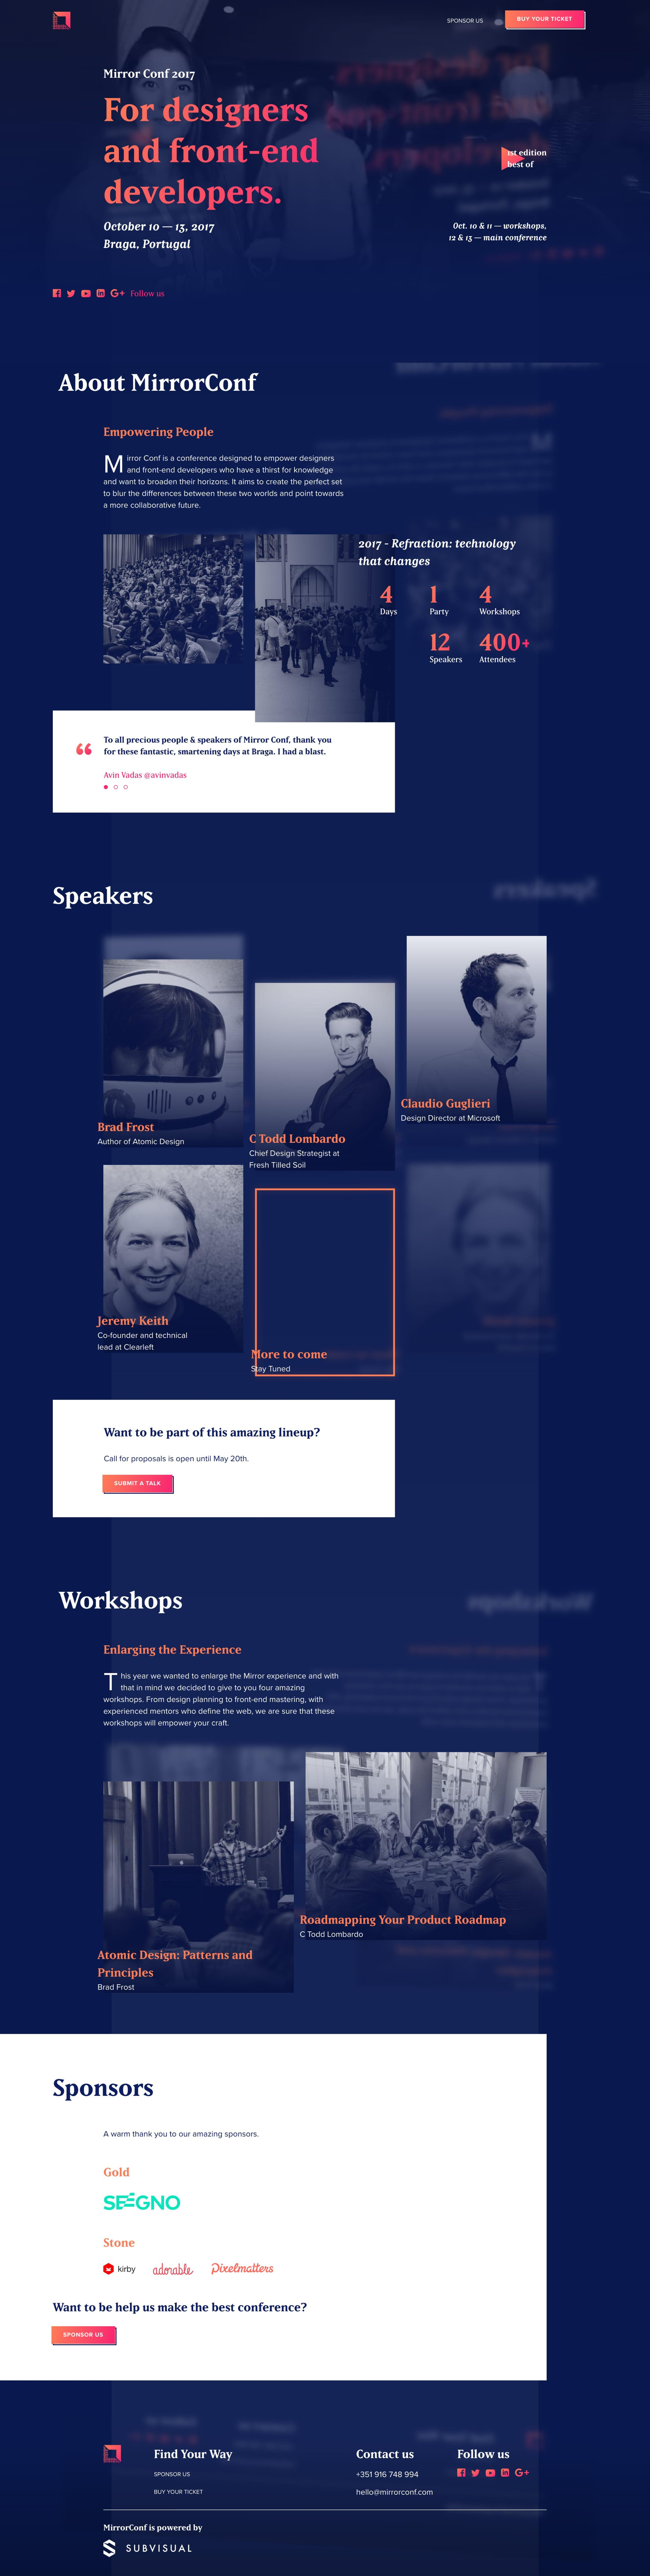 Mirror Conf 2017 Website Screenshot